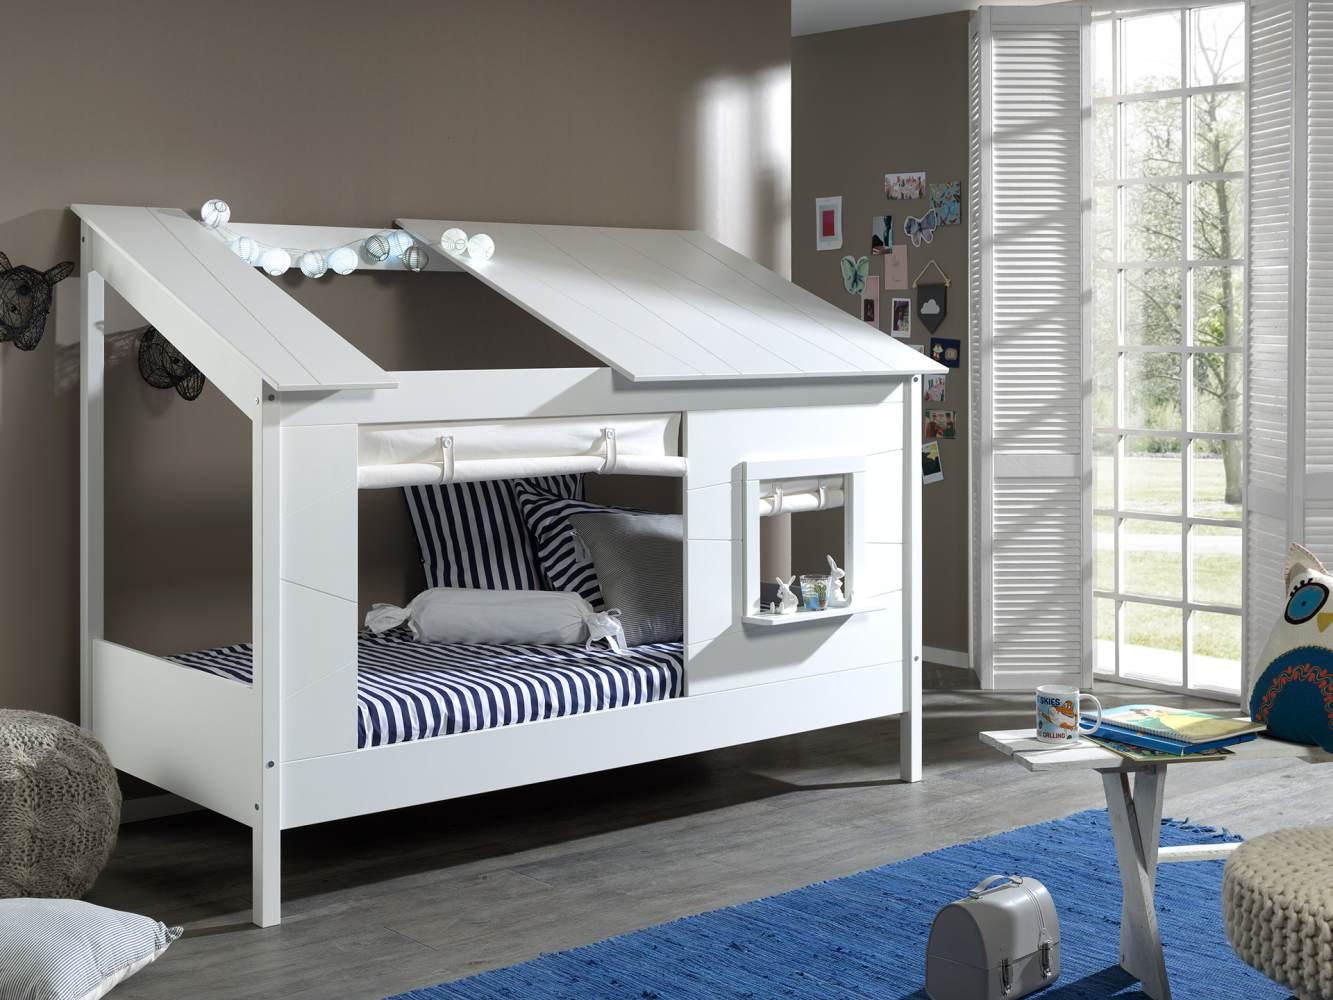 Vipack 'Baumhaus' Kinderbett 90 x 200 cm, Weiß, inkl. Vorhang Set Bild 1